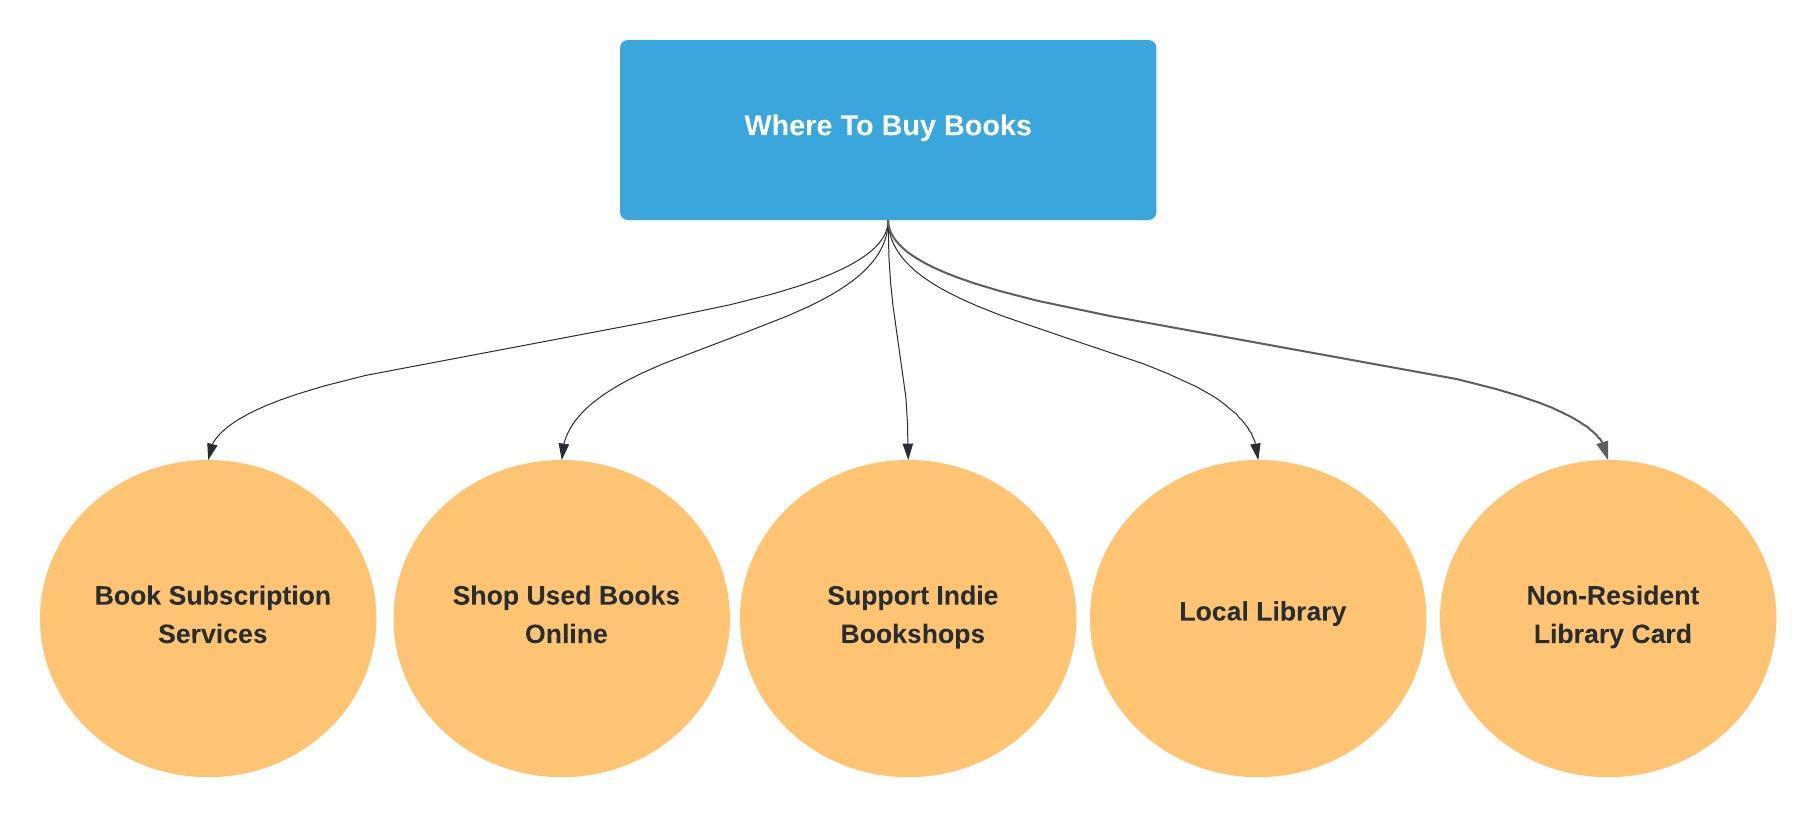 Book Club Where To Buy Books Diagram